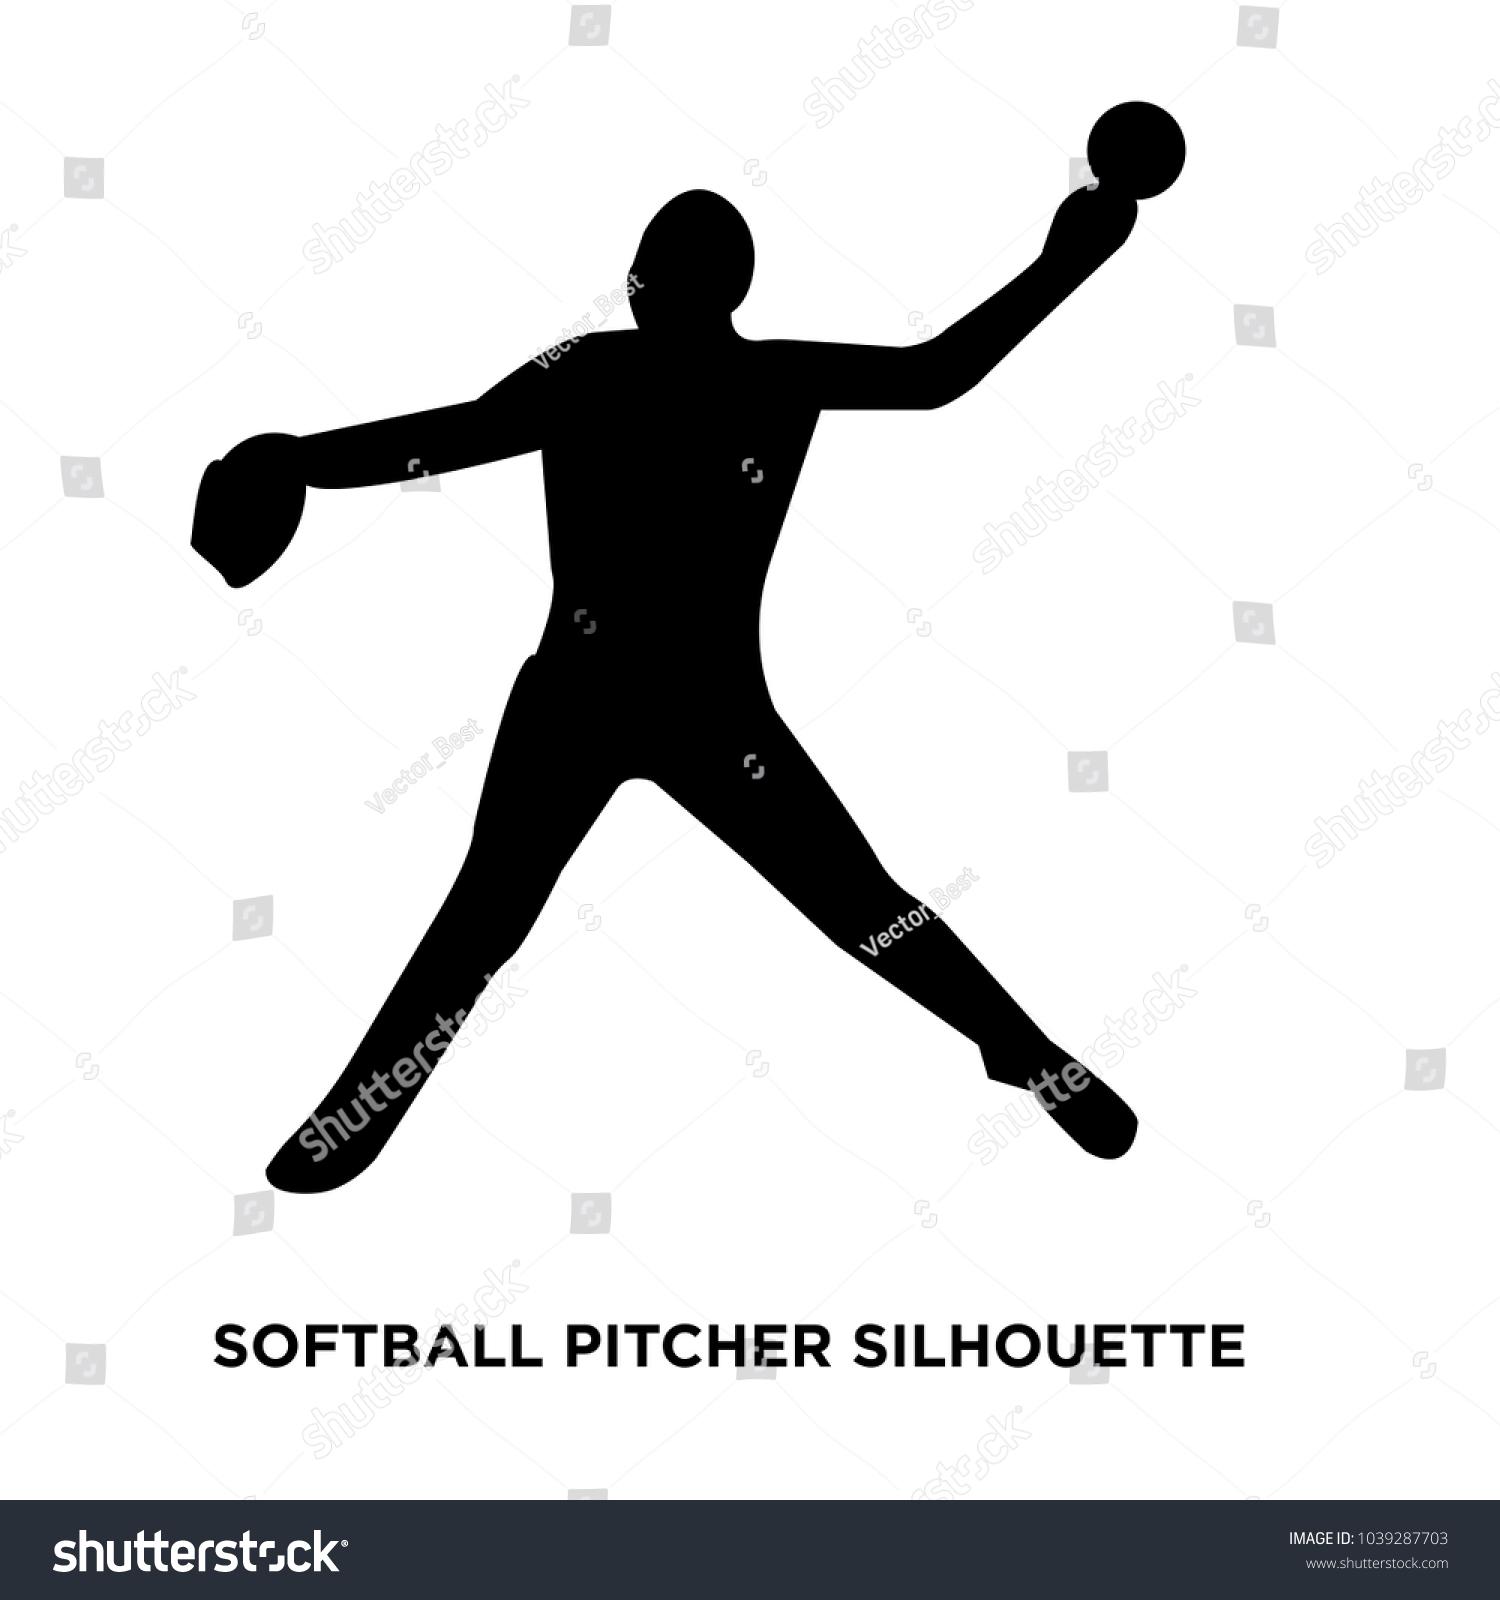 softball pitcher silhouette on white background ez canvas